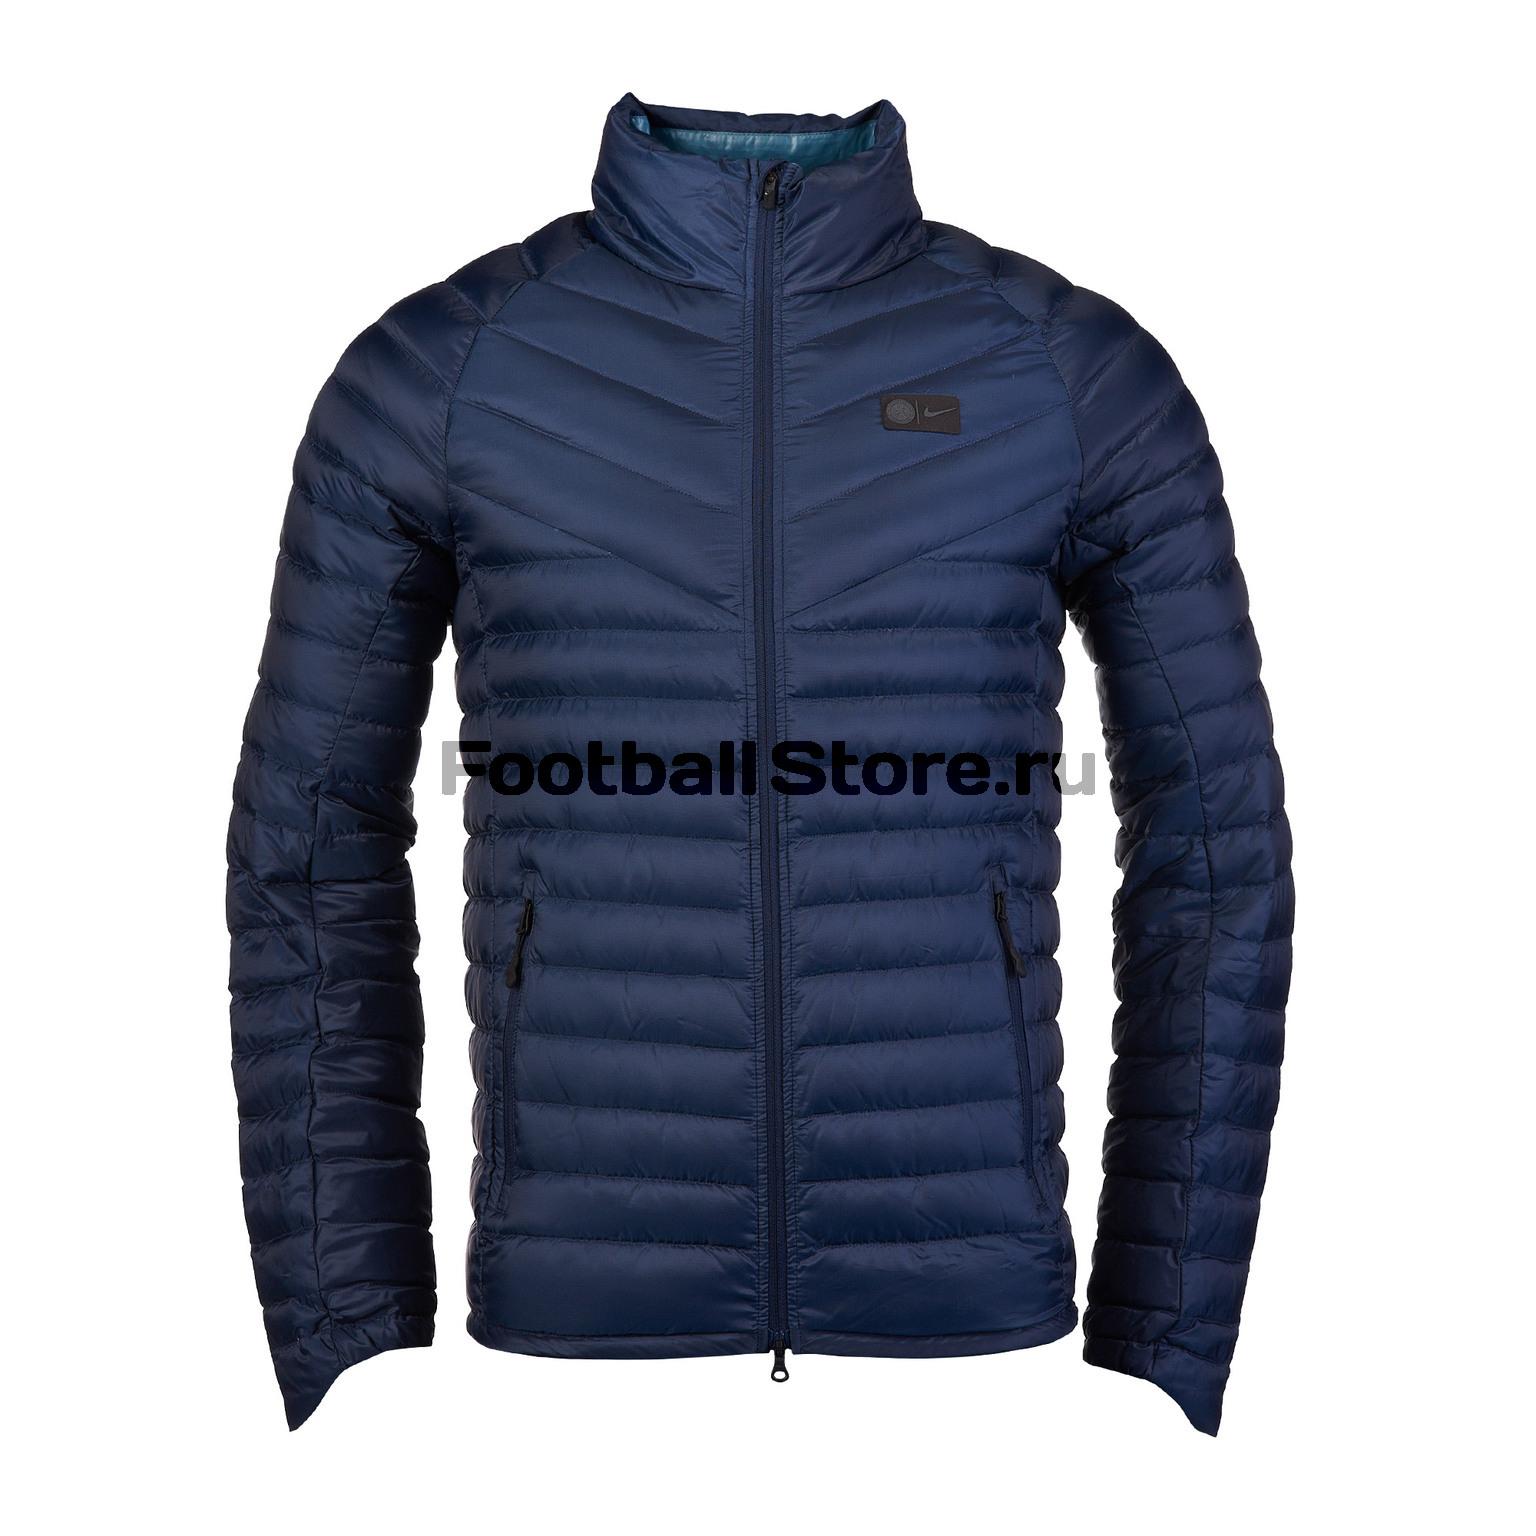 купить Куртка Nike Chelsea AH7429-455 дешево